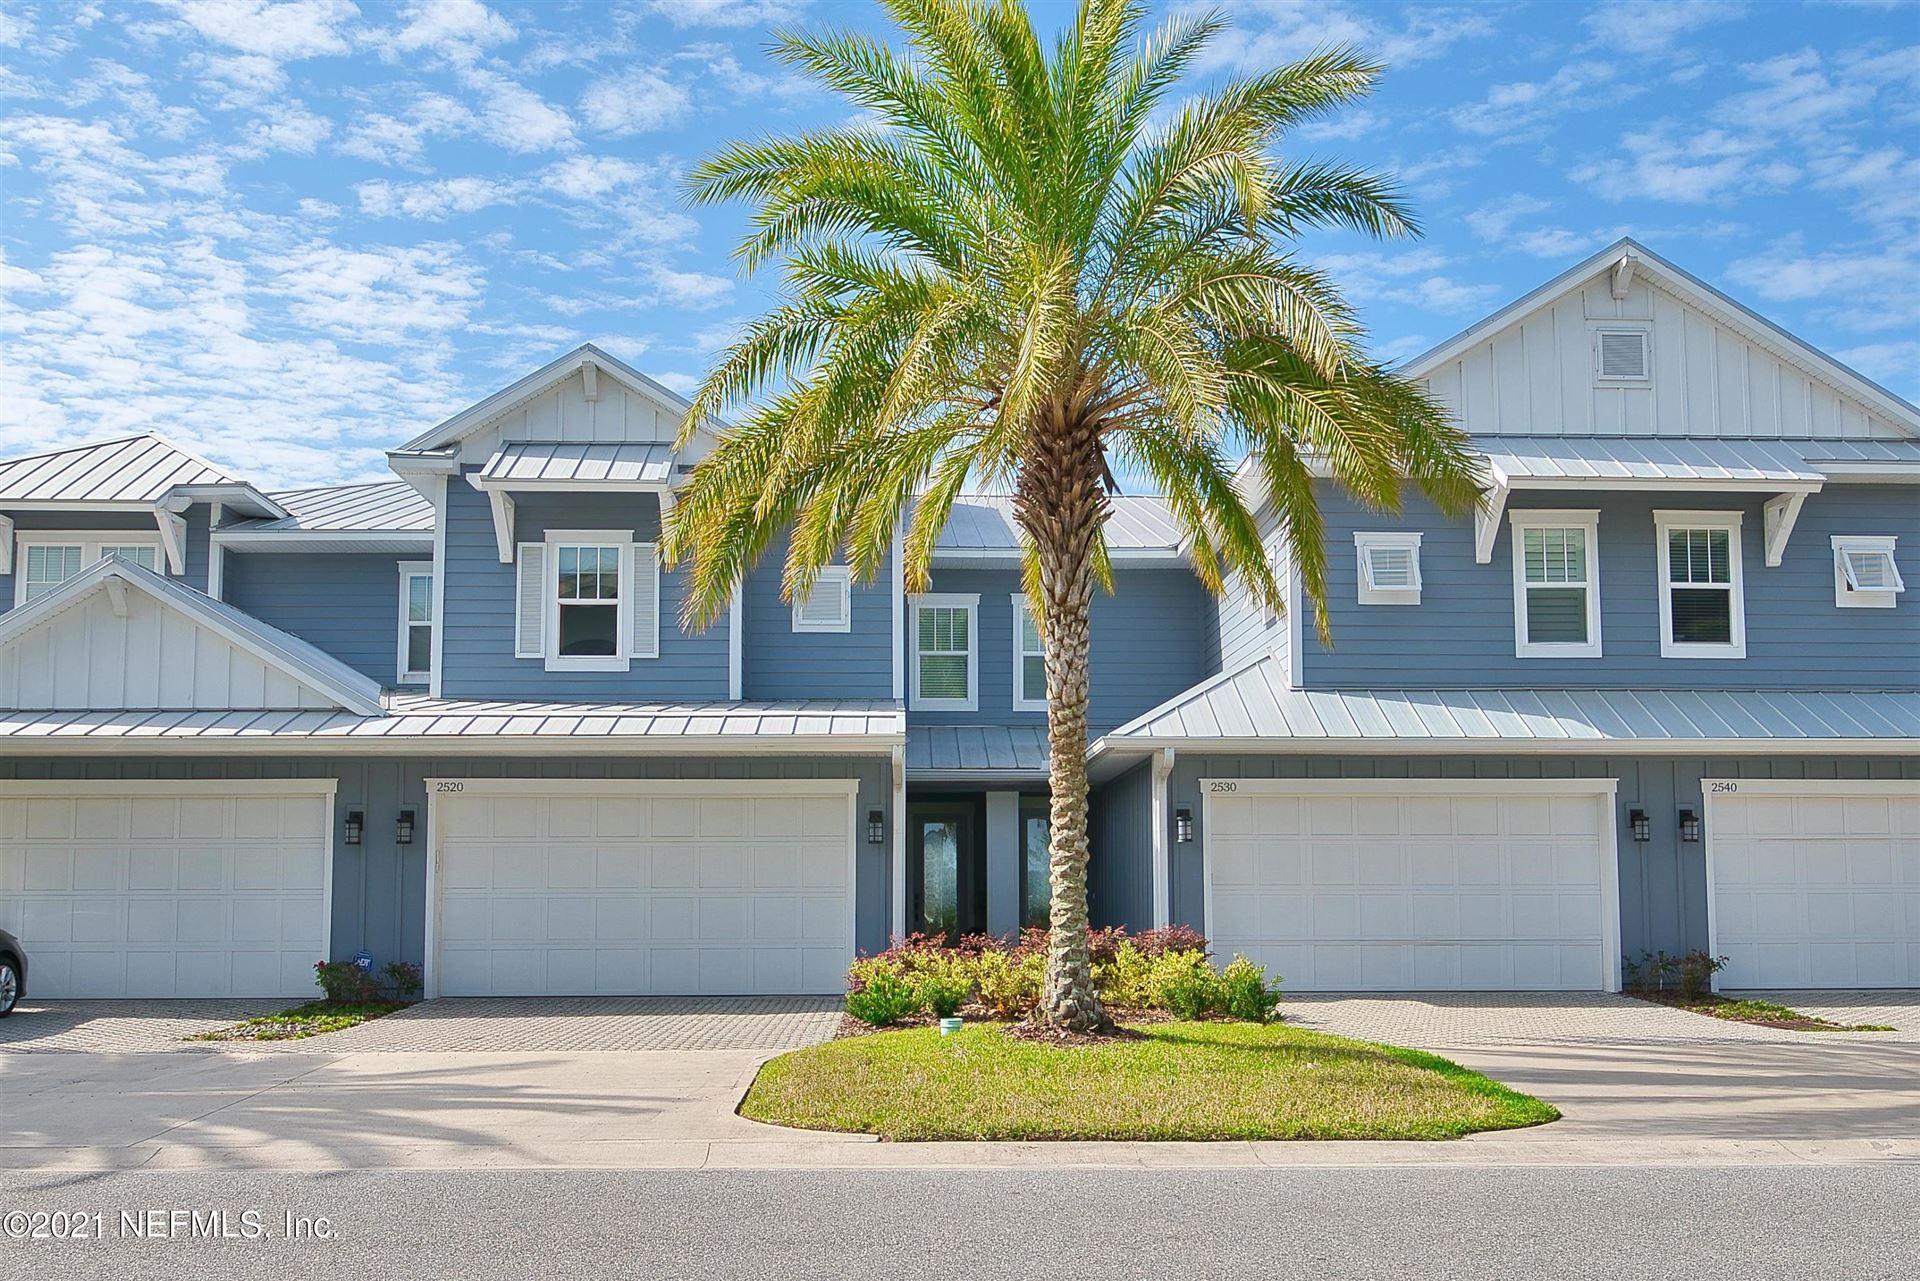 2520 BEACH BLVD, Jacksonville Beach, FL 32250 - MLS#: 1105236